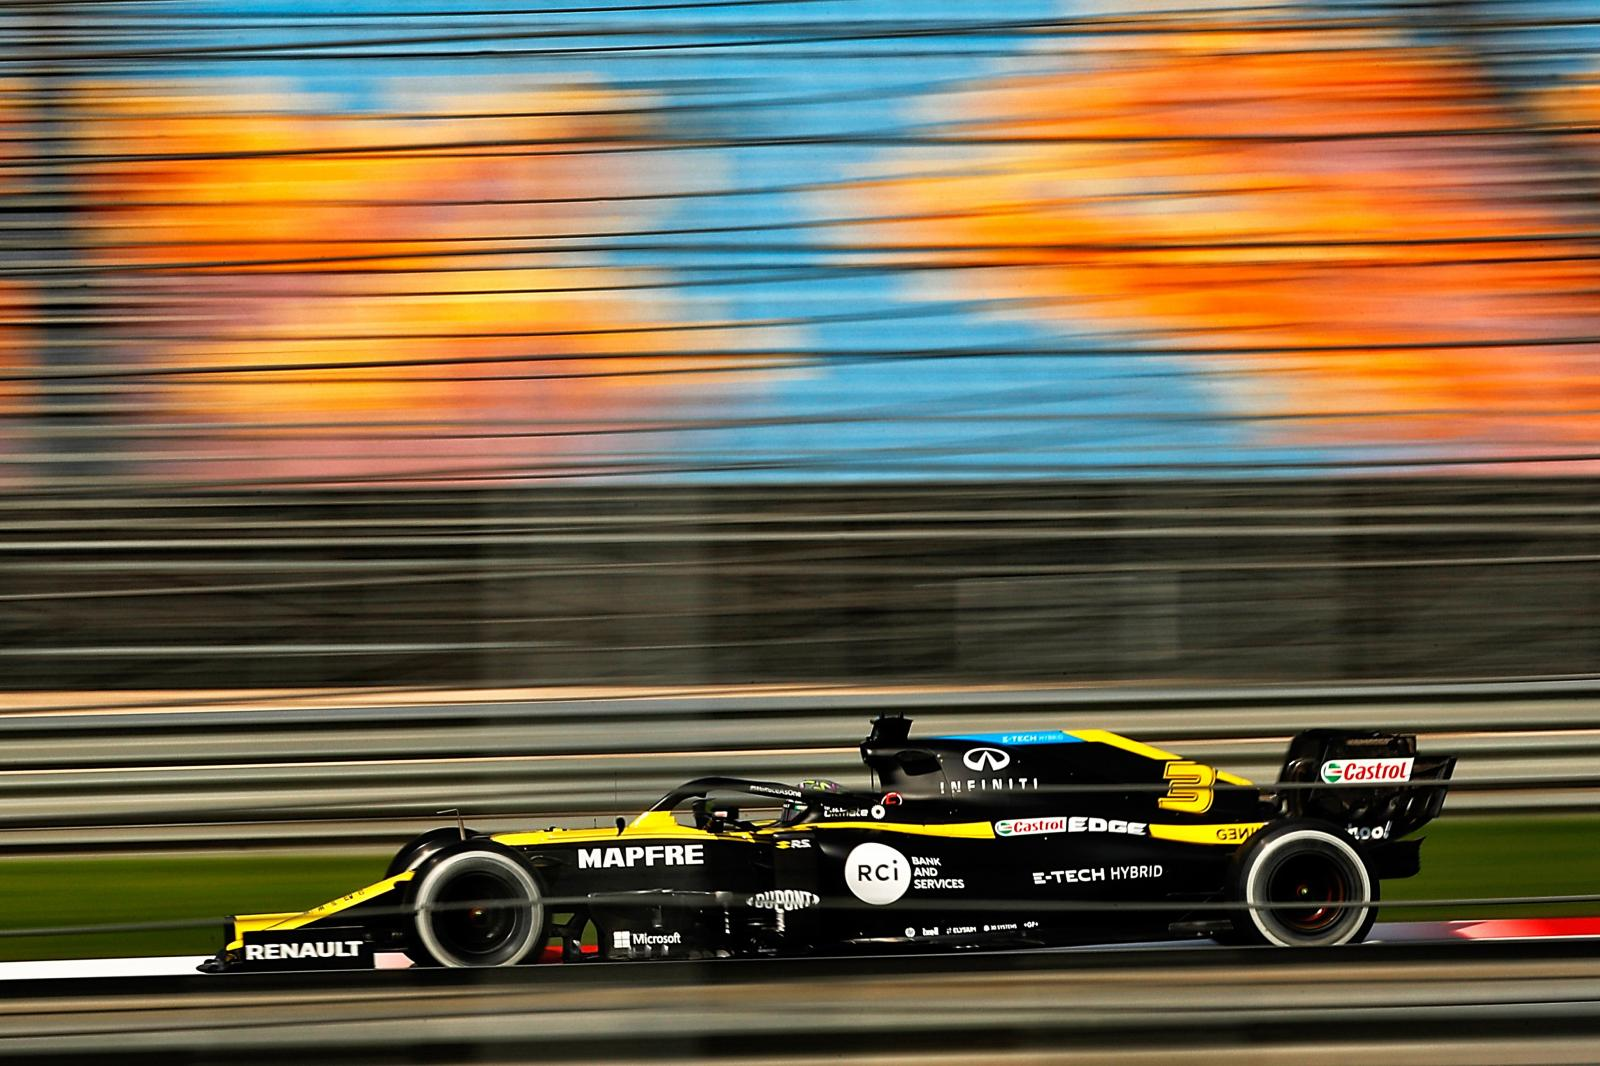 Grand Prix de Formule 1 de Turquie 2020-7